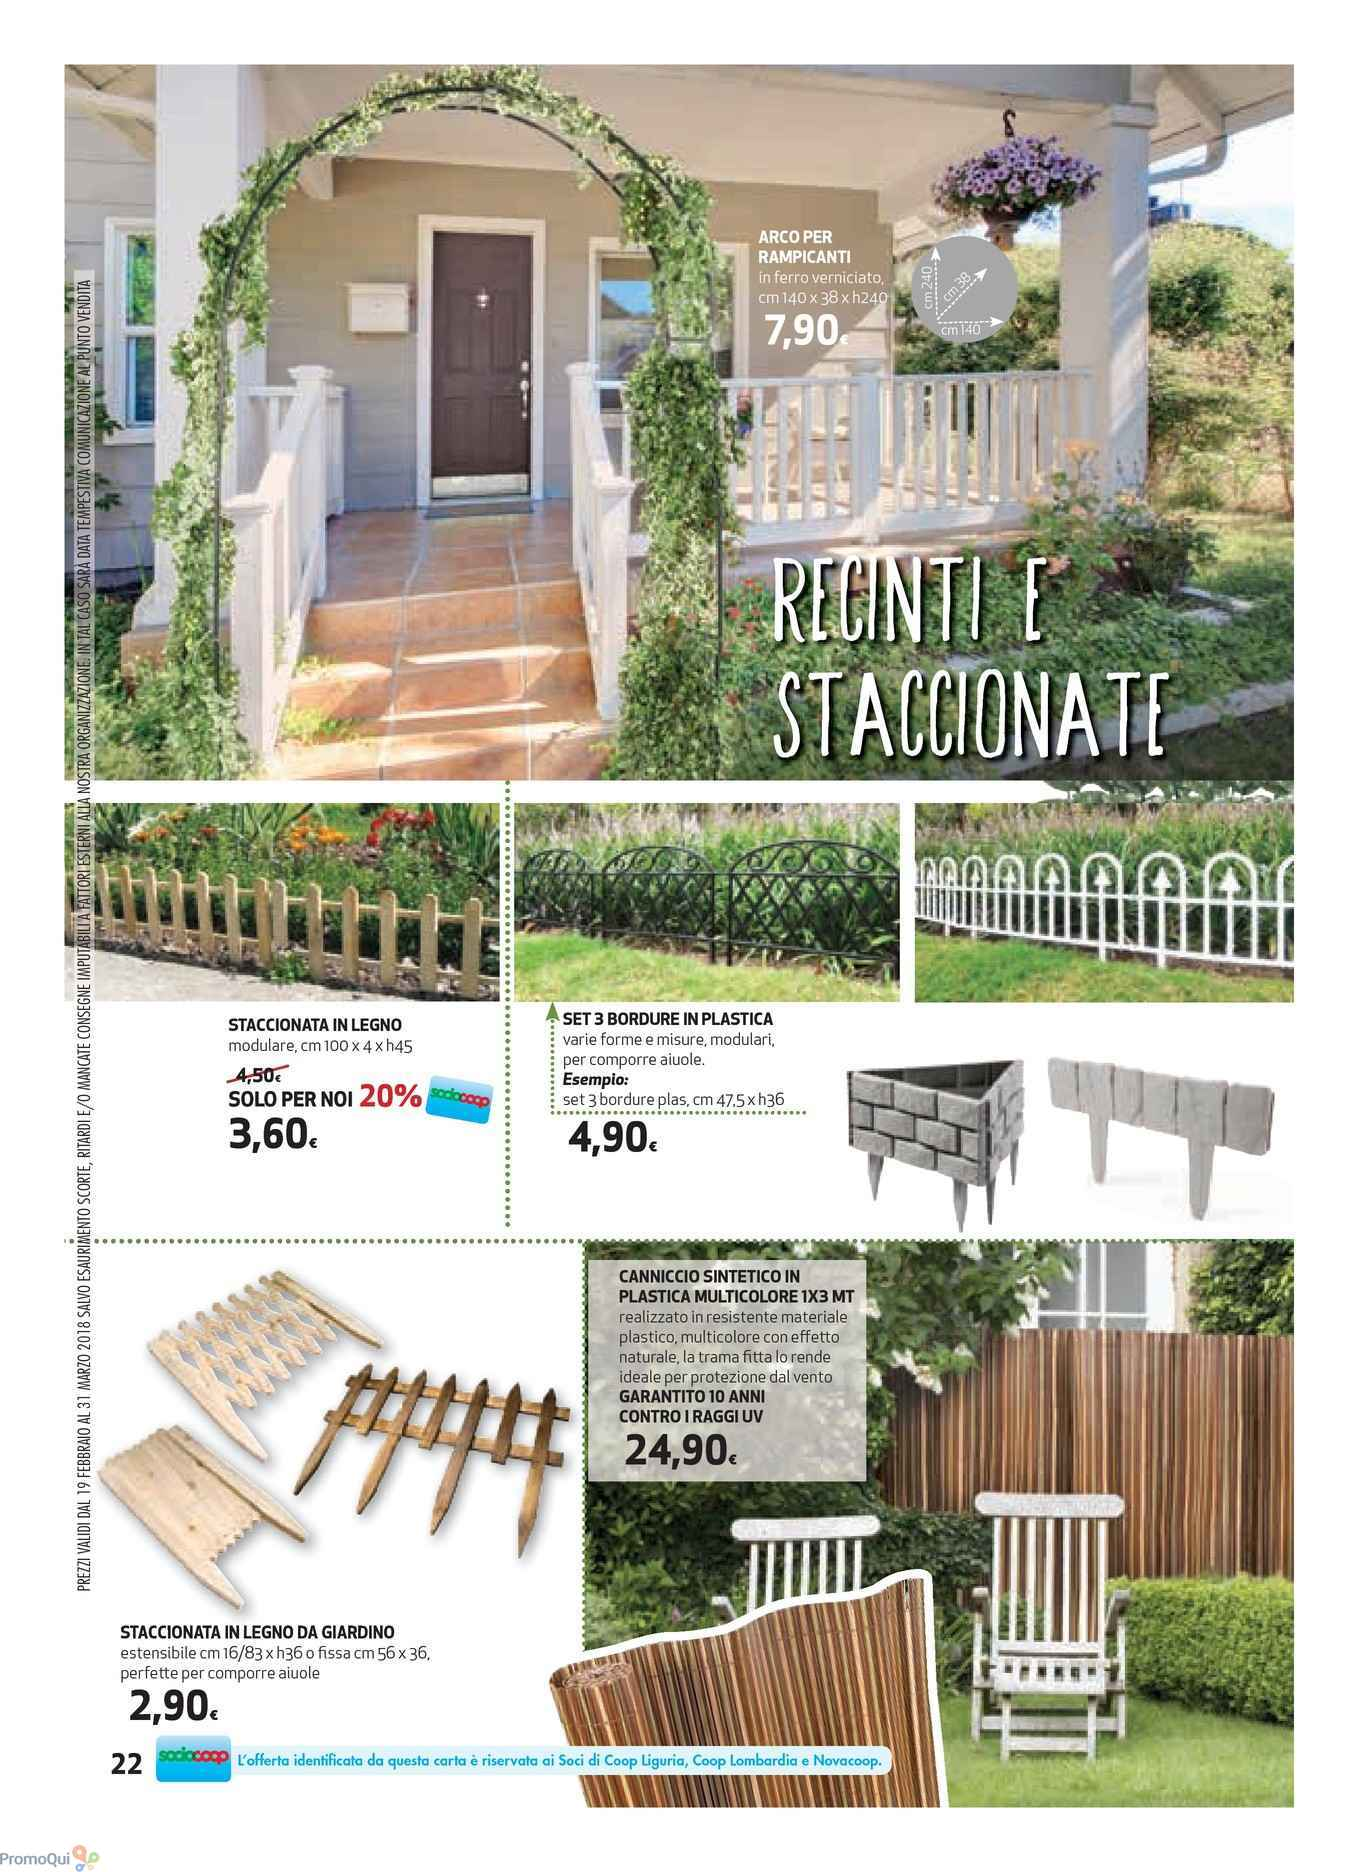 Awesome Le Terrazze Ipercoop Photos - Idee Arredamento Casa - baoliao.us